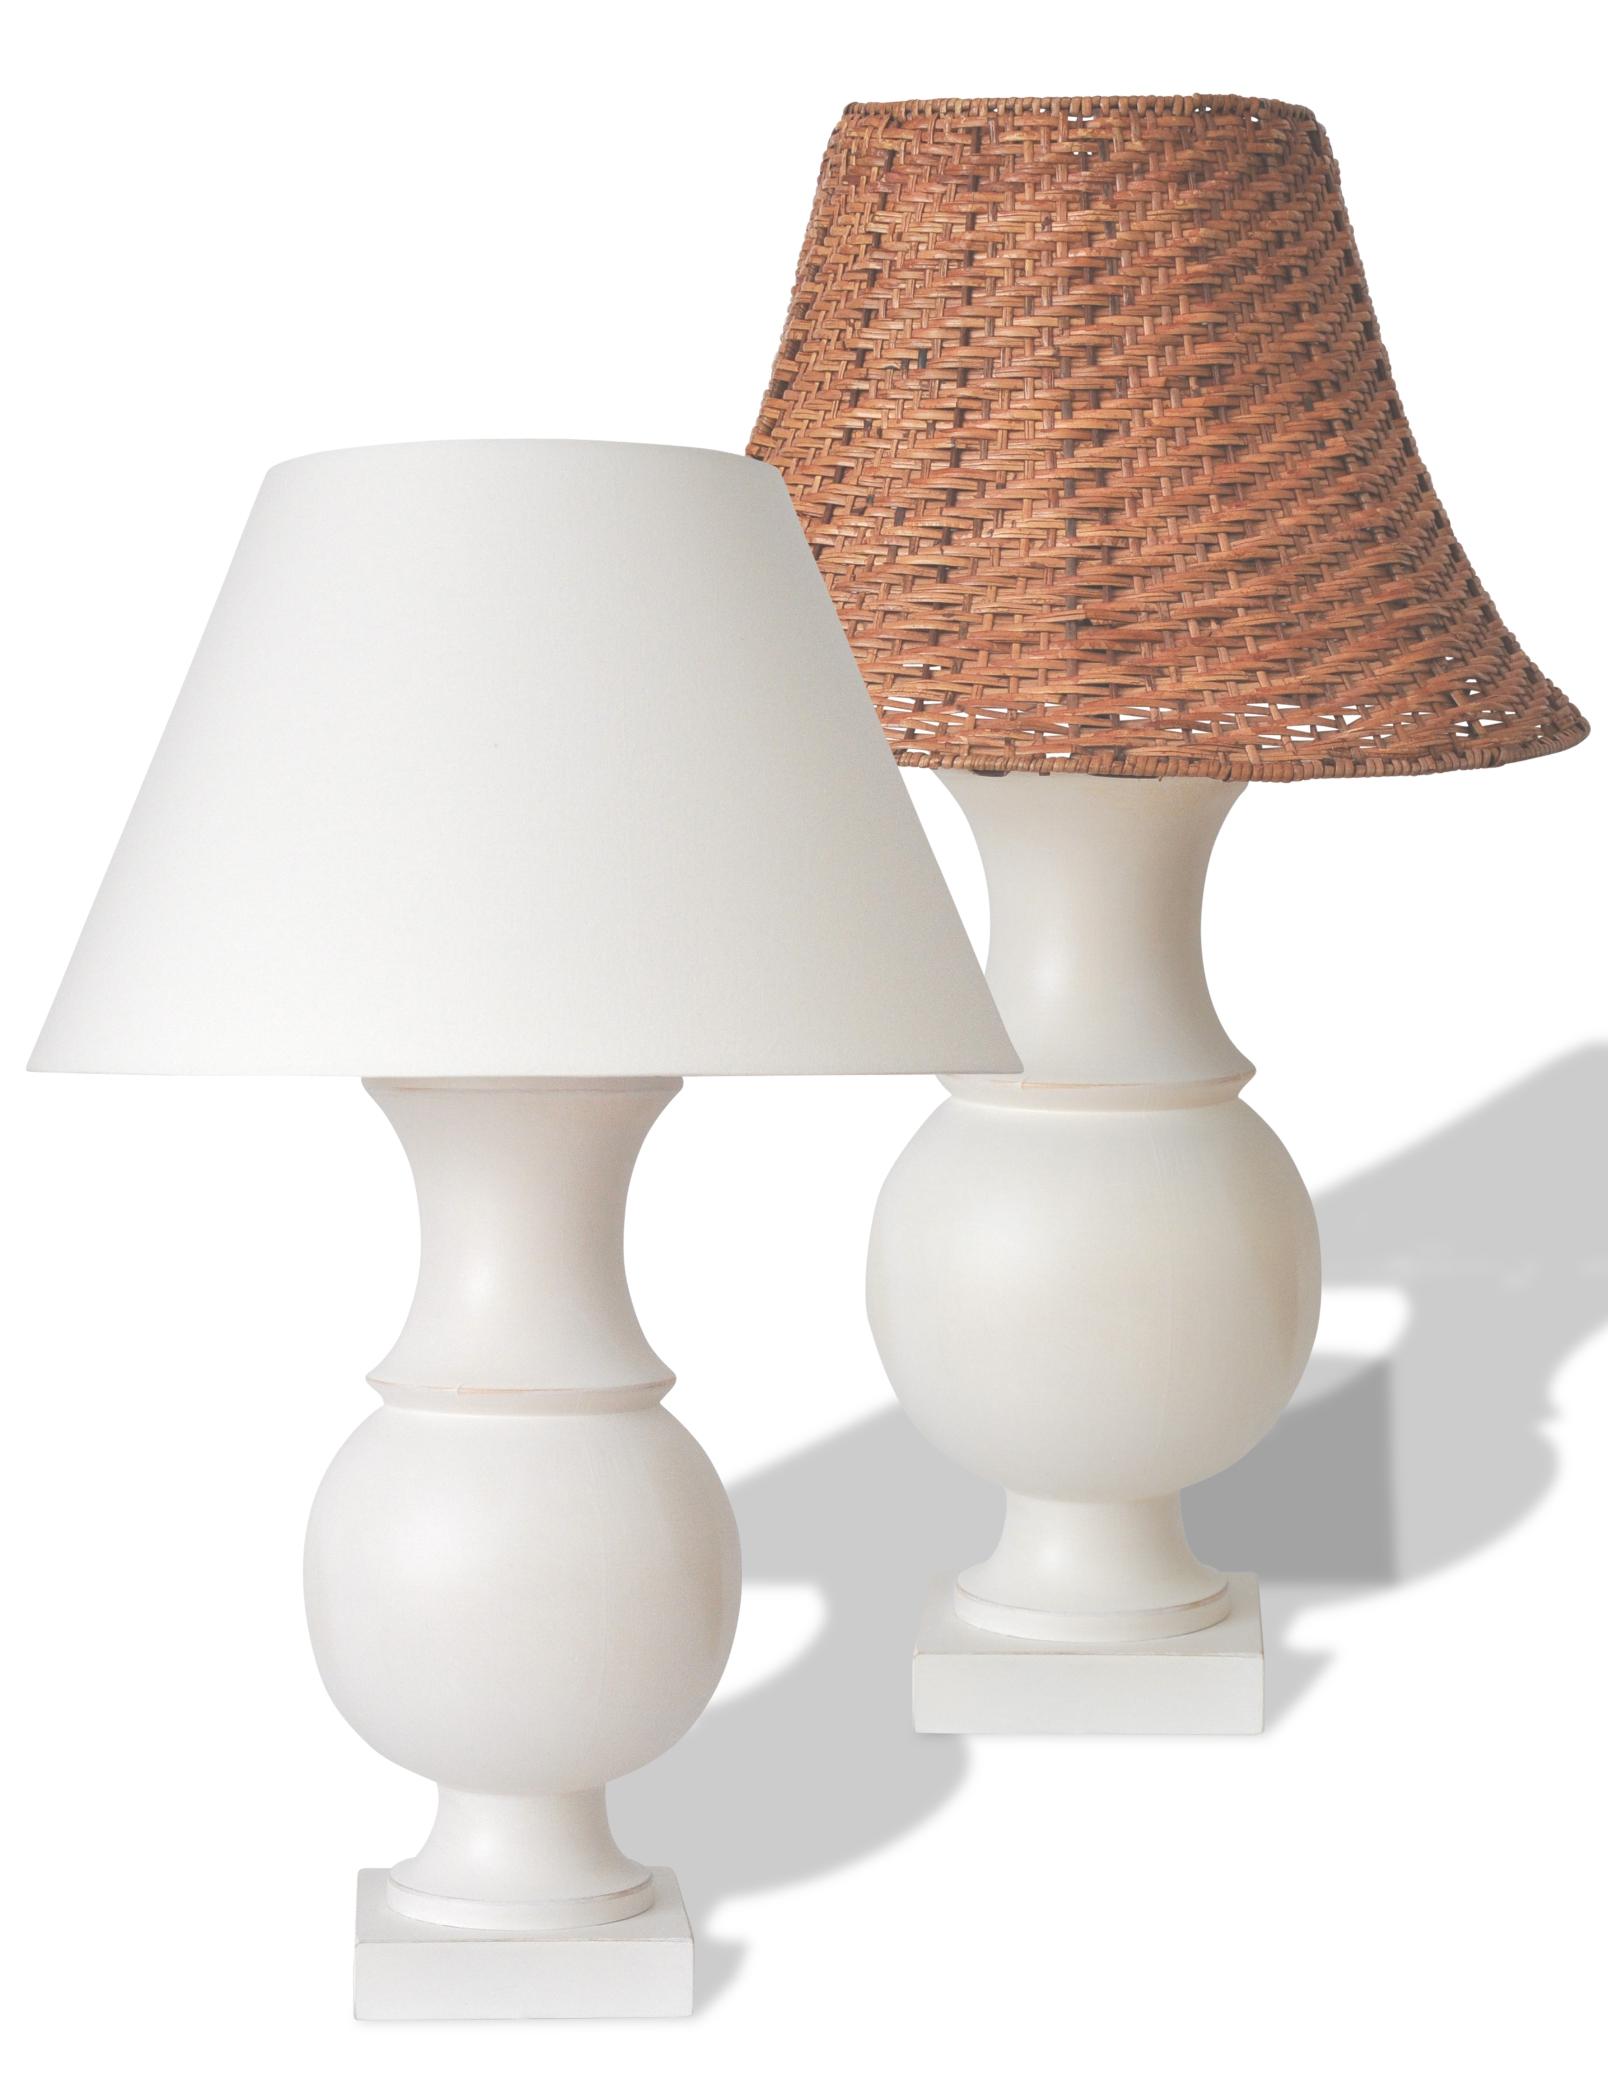 tischleuchte aus holz runde ballig gedrechselte form ohne. Black Bedroom Furniture Sets. Home Design Ideas